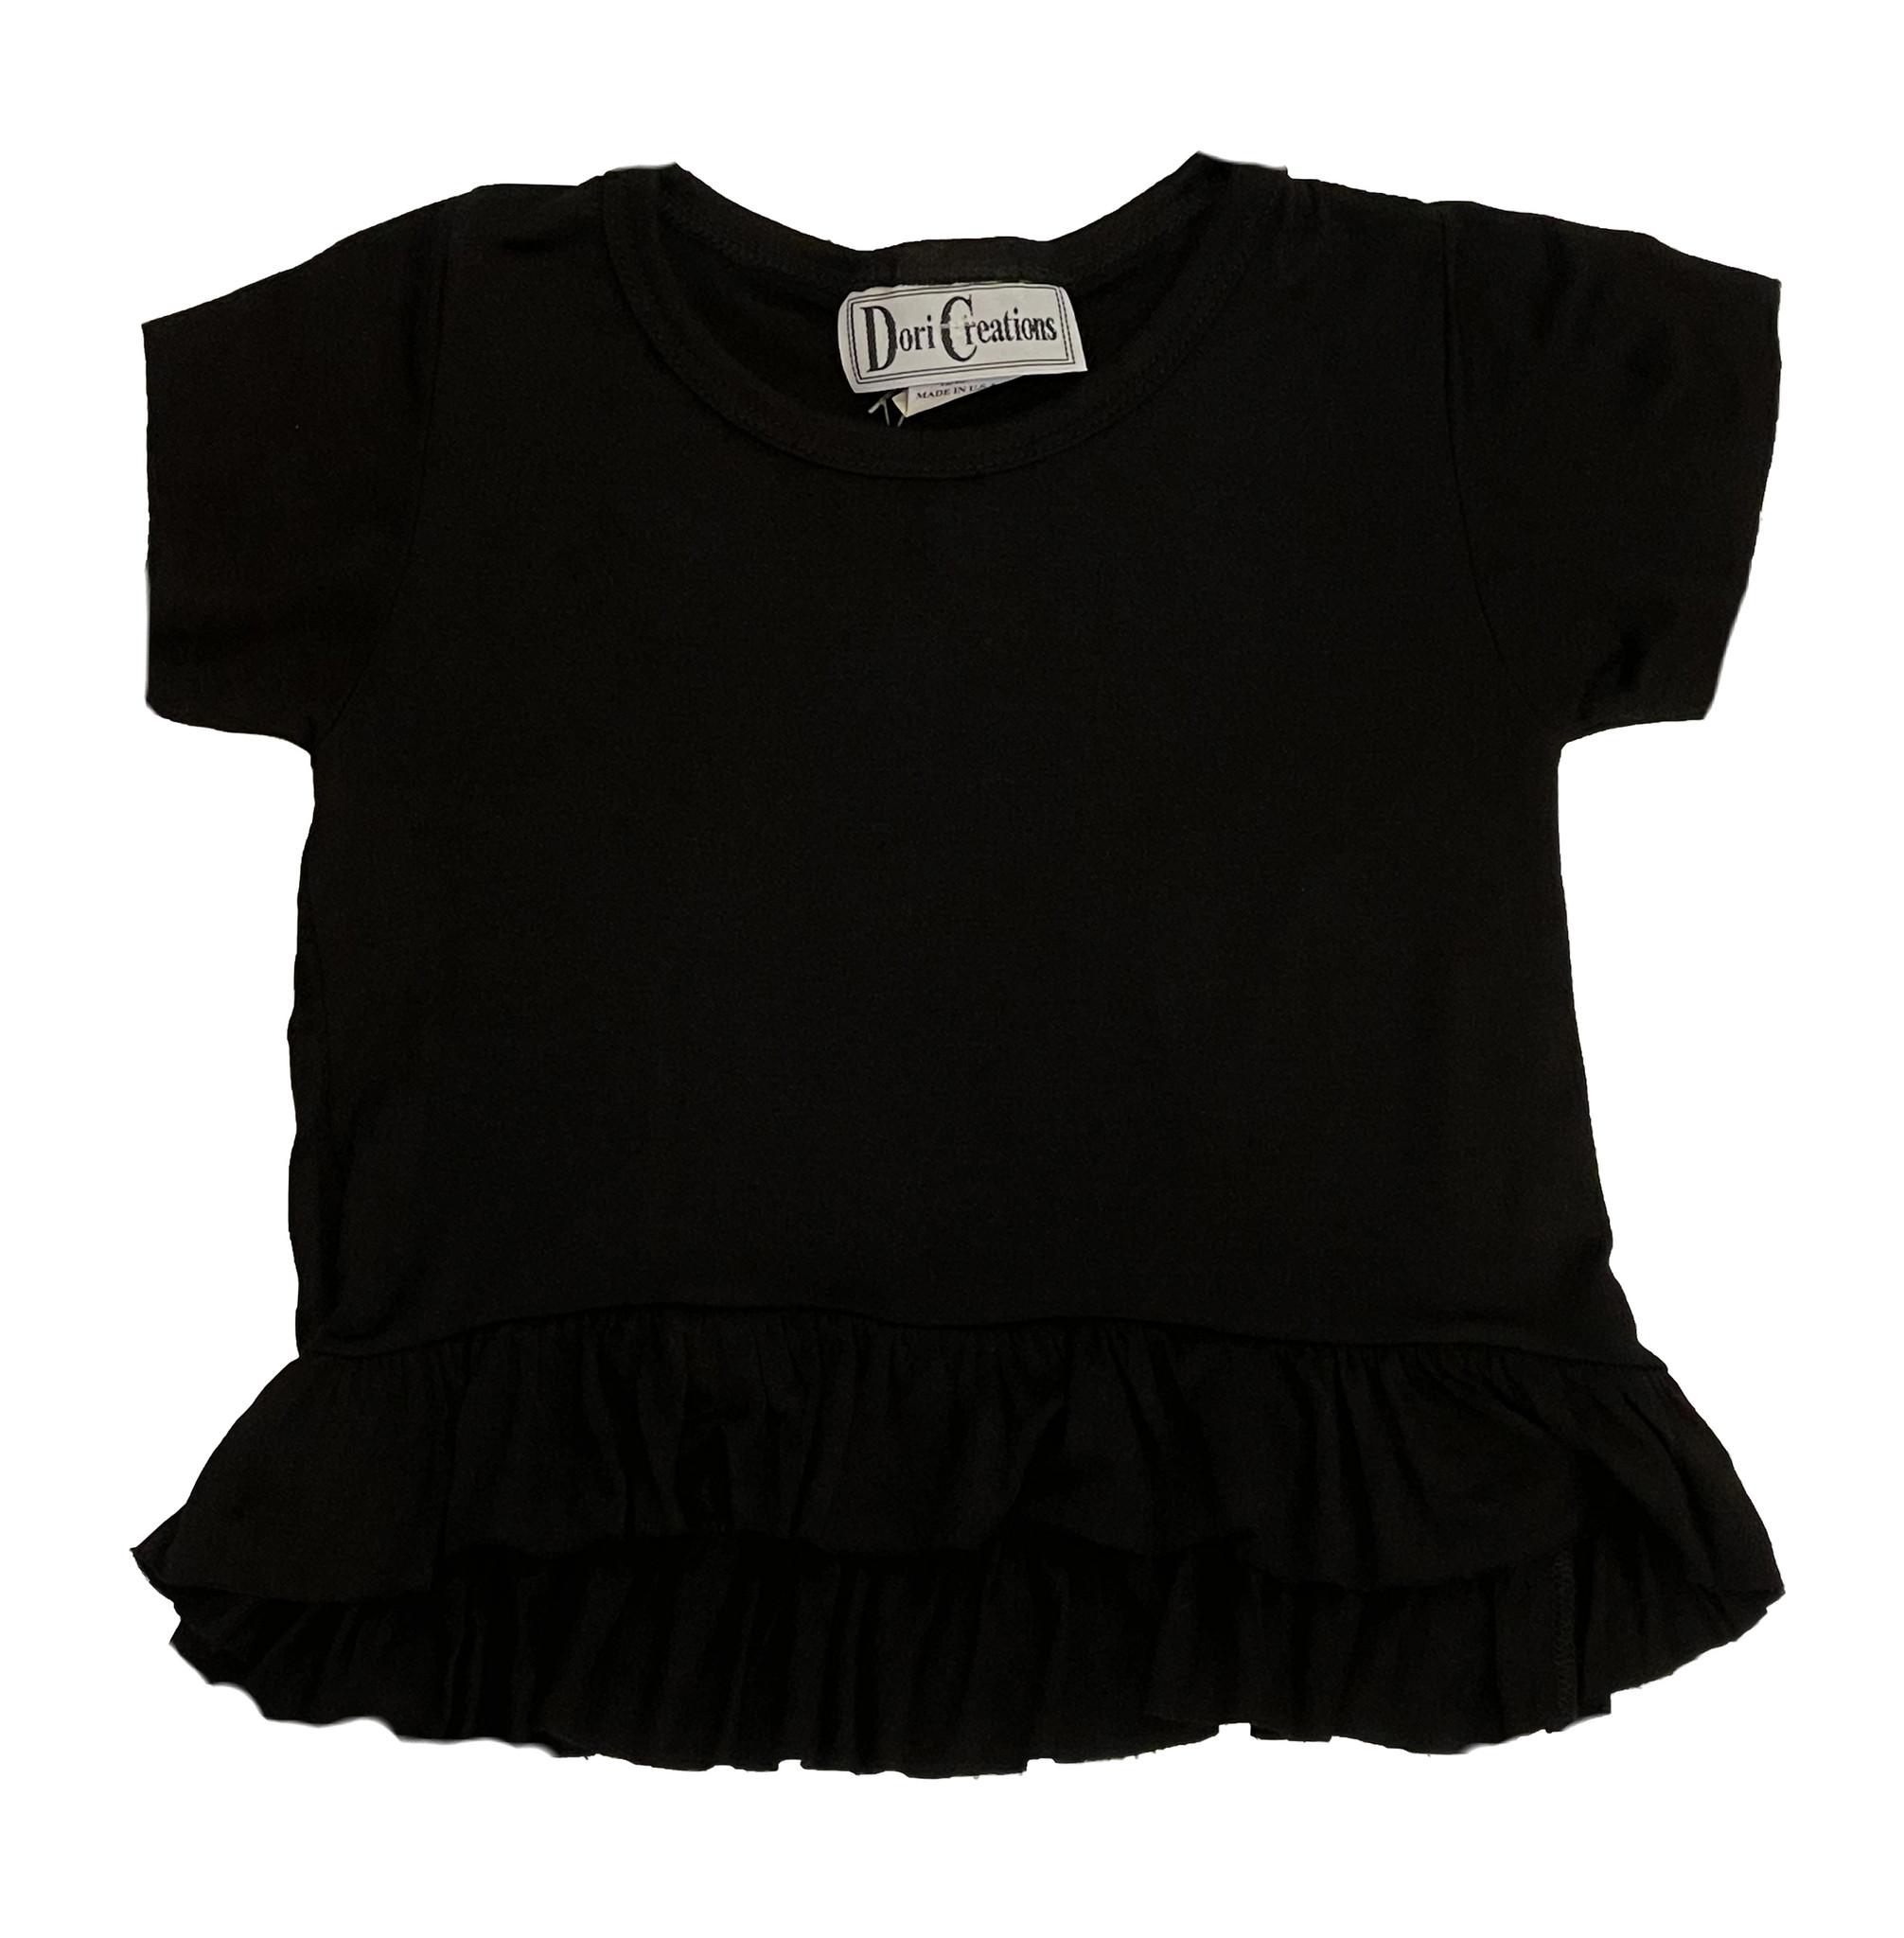 Dori Ruffle Infant Tee Black